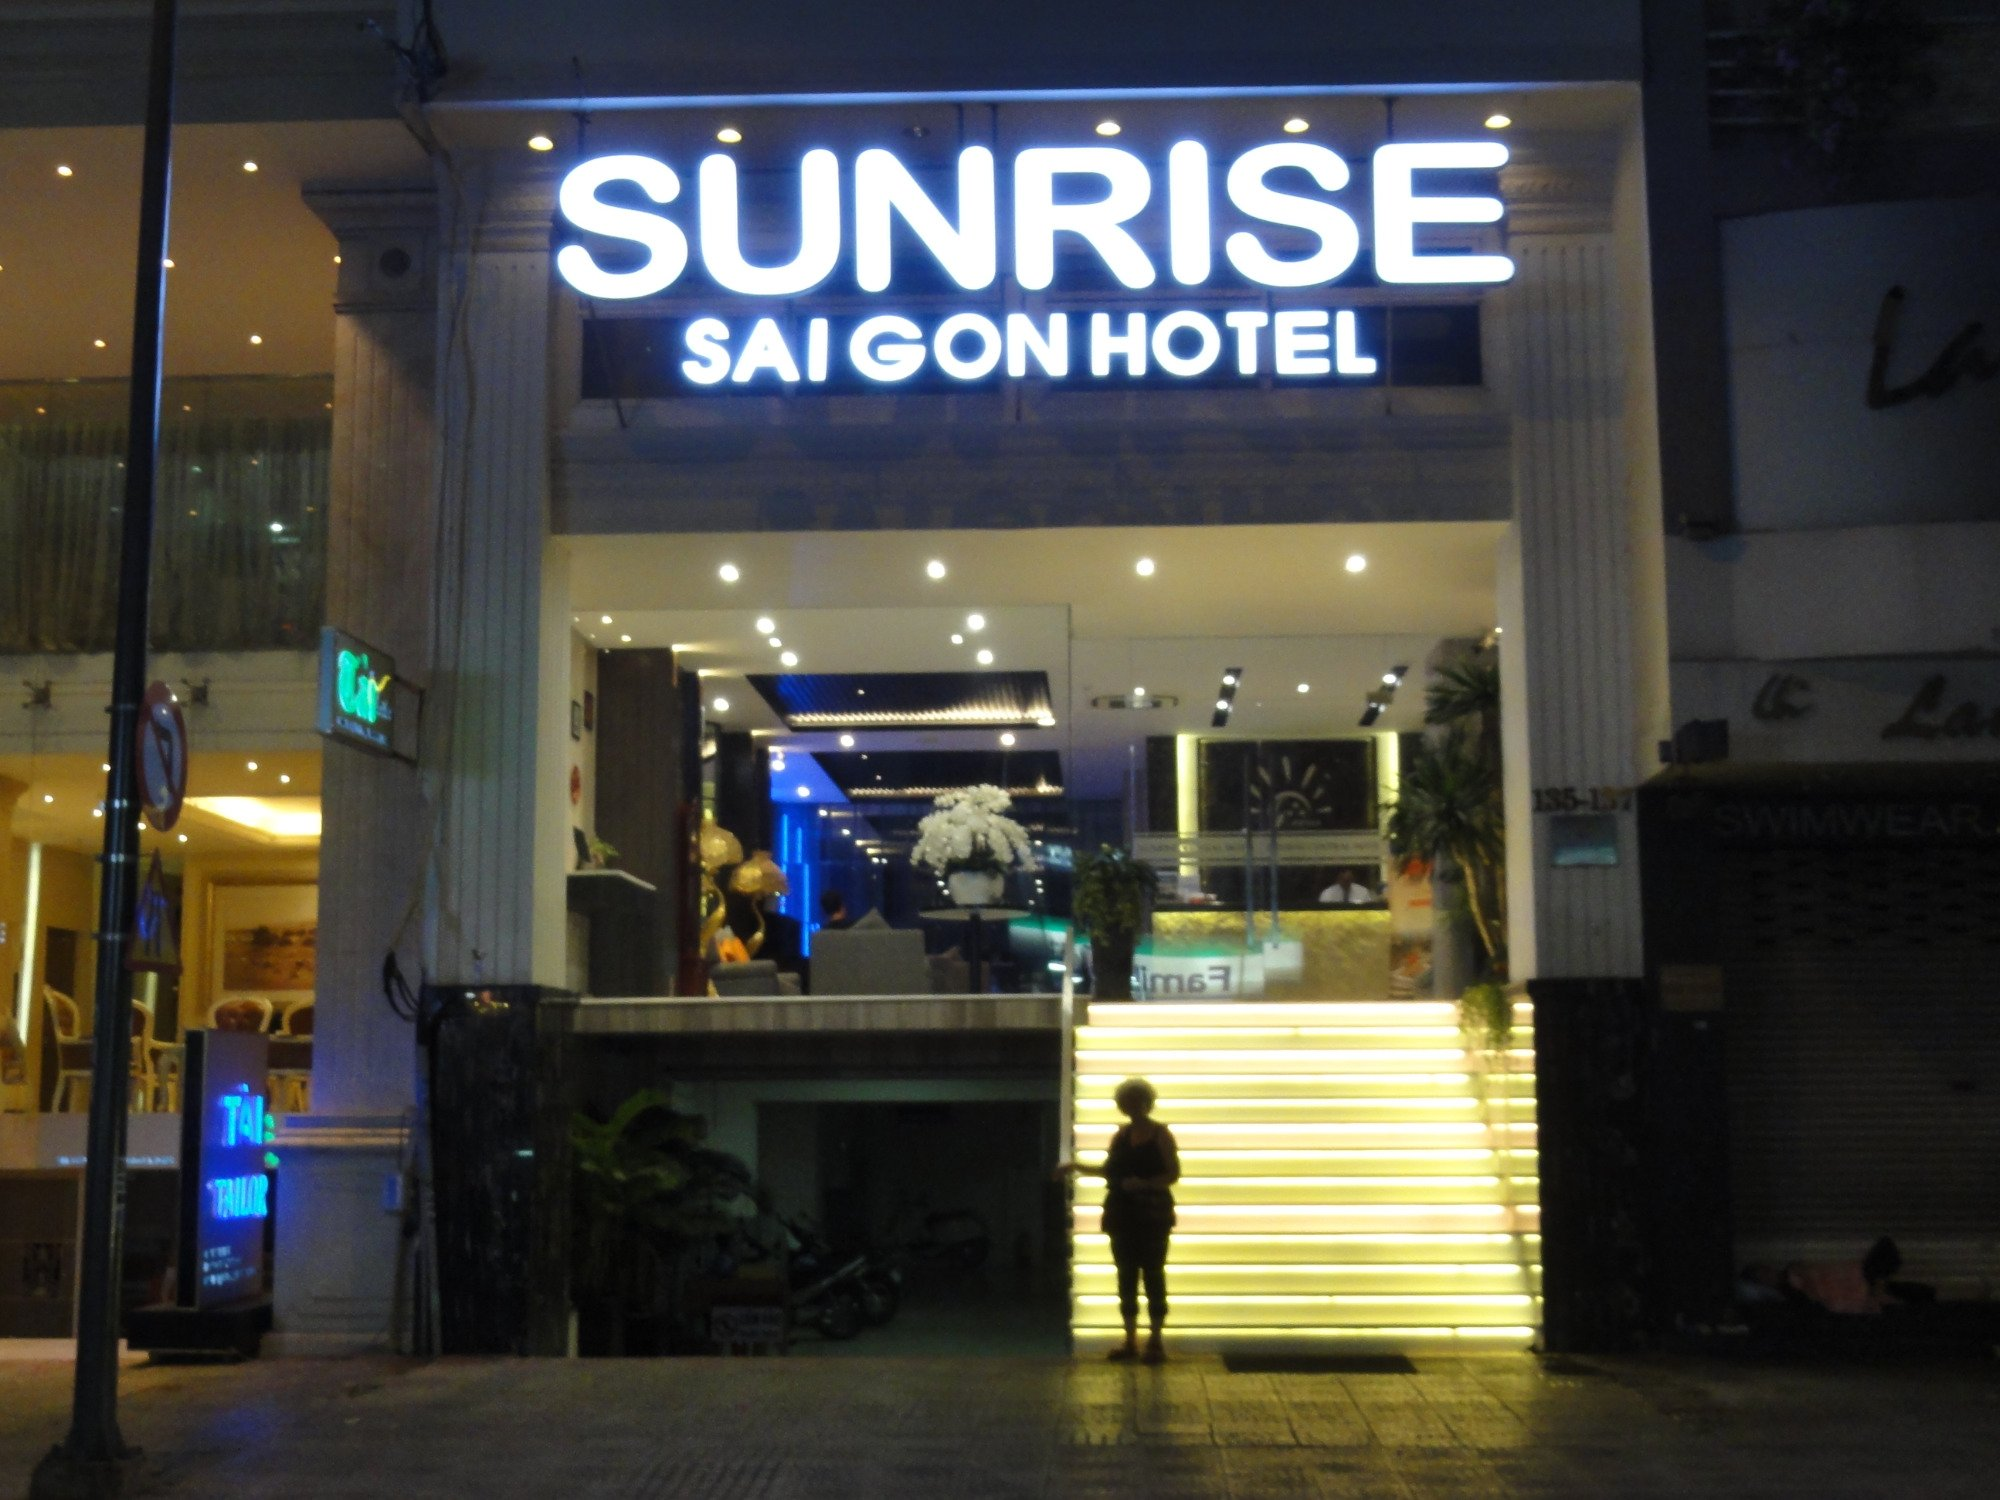 Sunrise Saigon Hotel